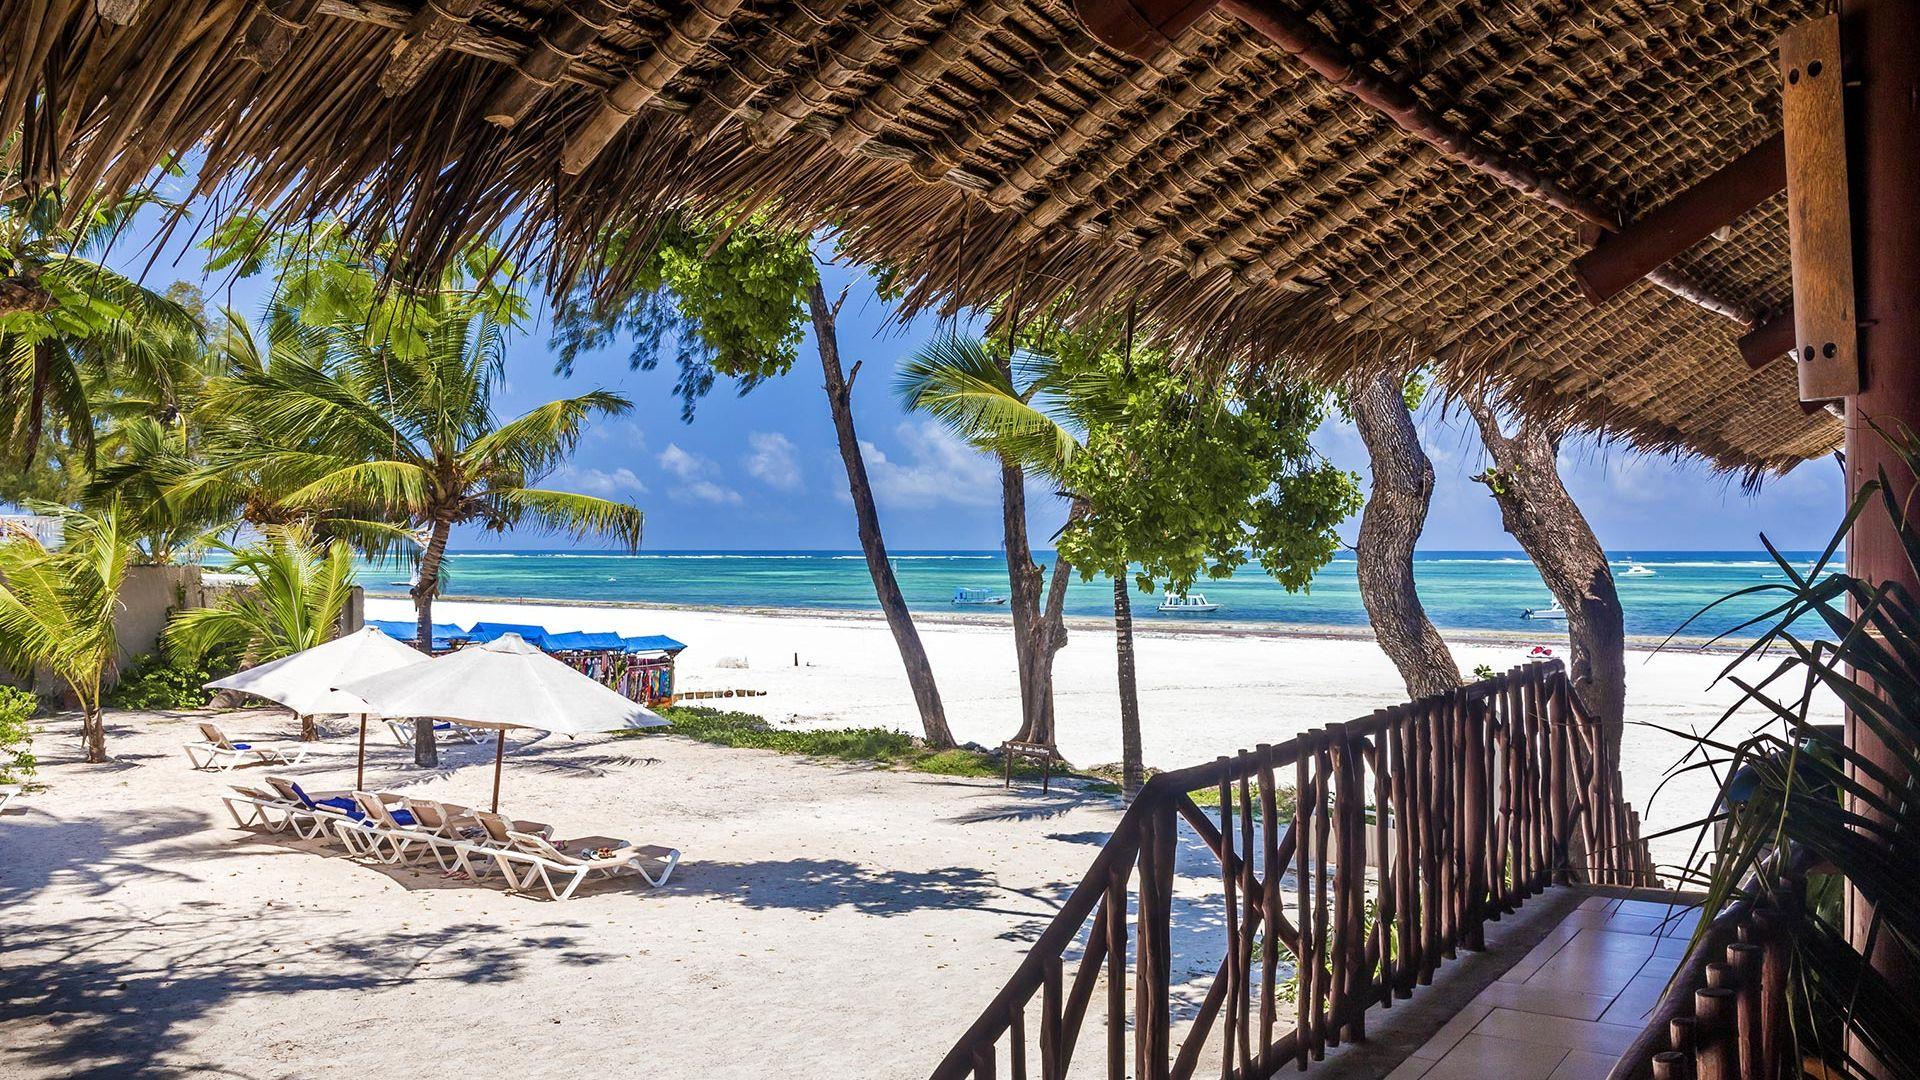 Sejur charter Diani Beach, Kenya, 8 zile - 05 iulie 2021